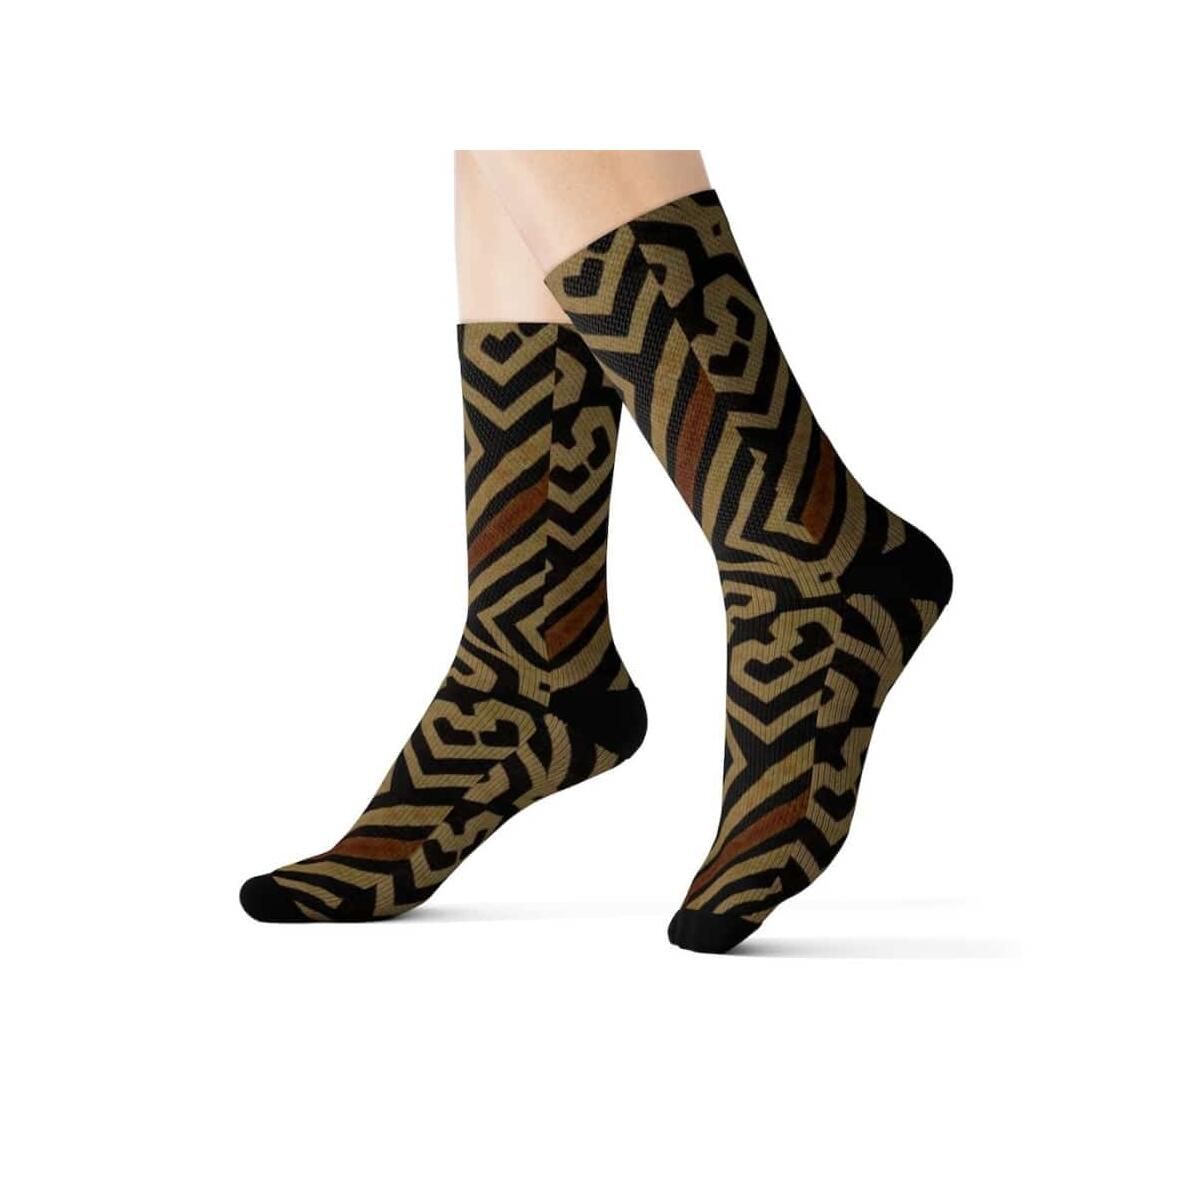 Bogolanfini Sublimation Socks